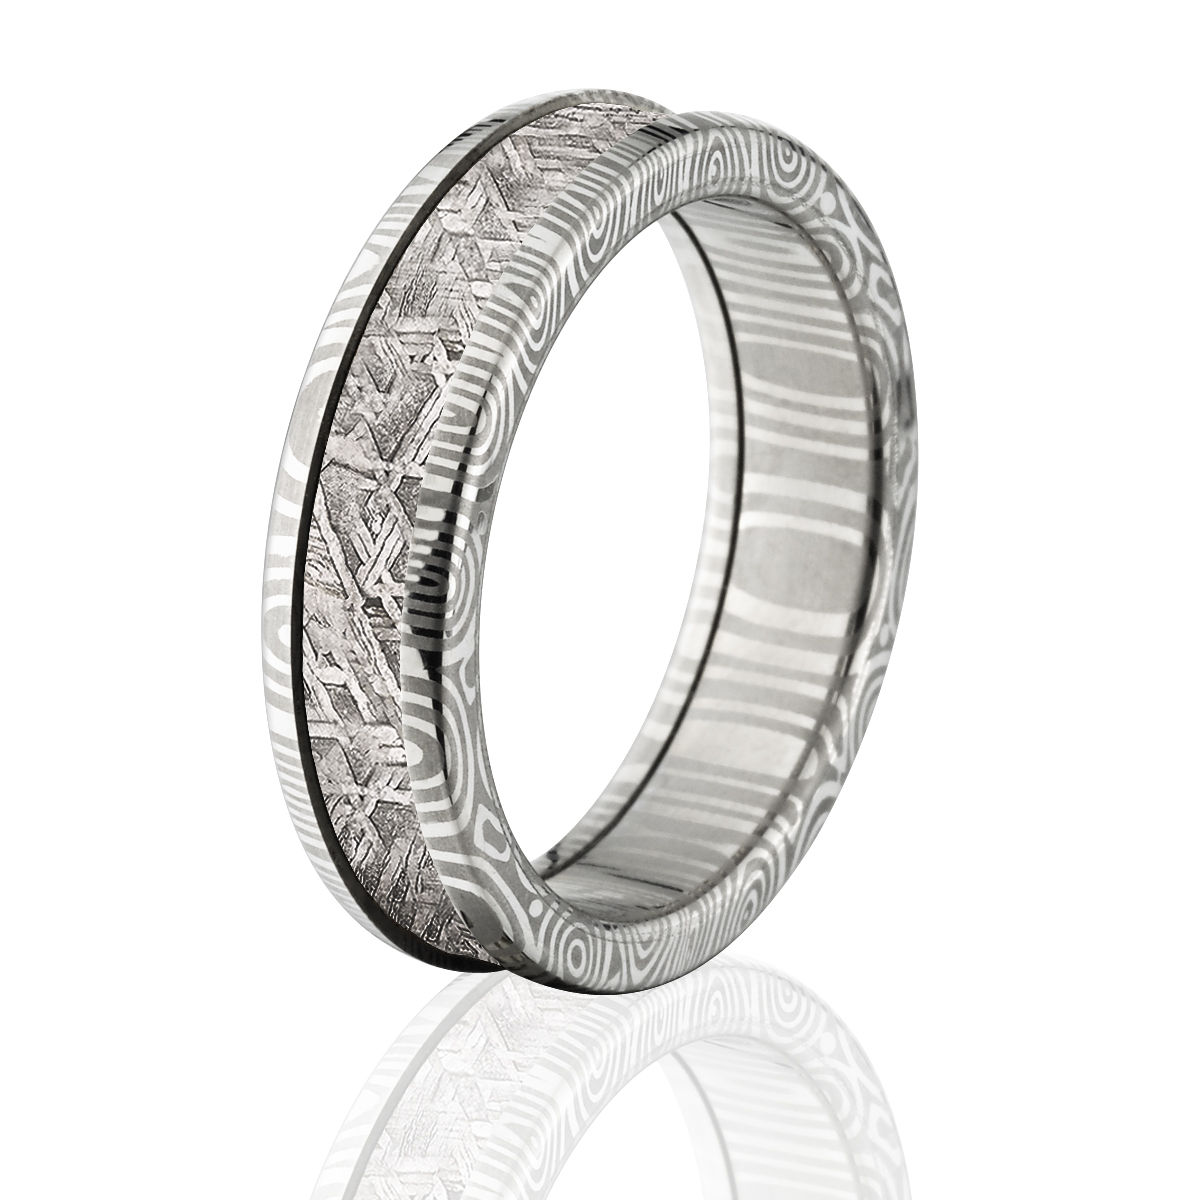 6mm Meteorite Wedding Band Gibeon Meteorite Ring & Combo Damascus Steel